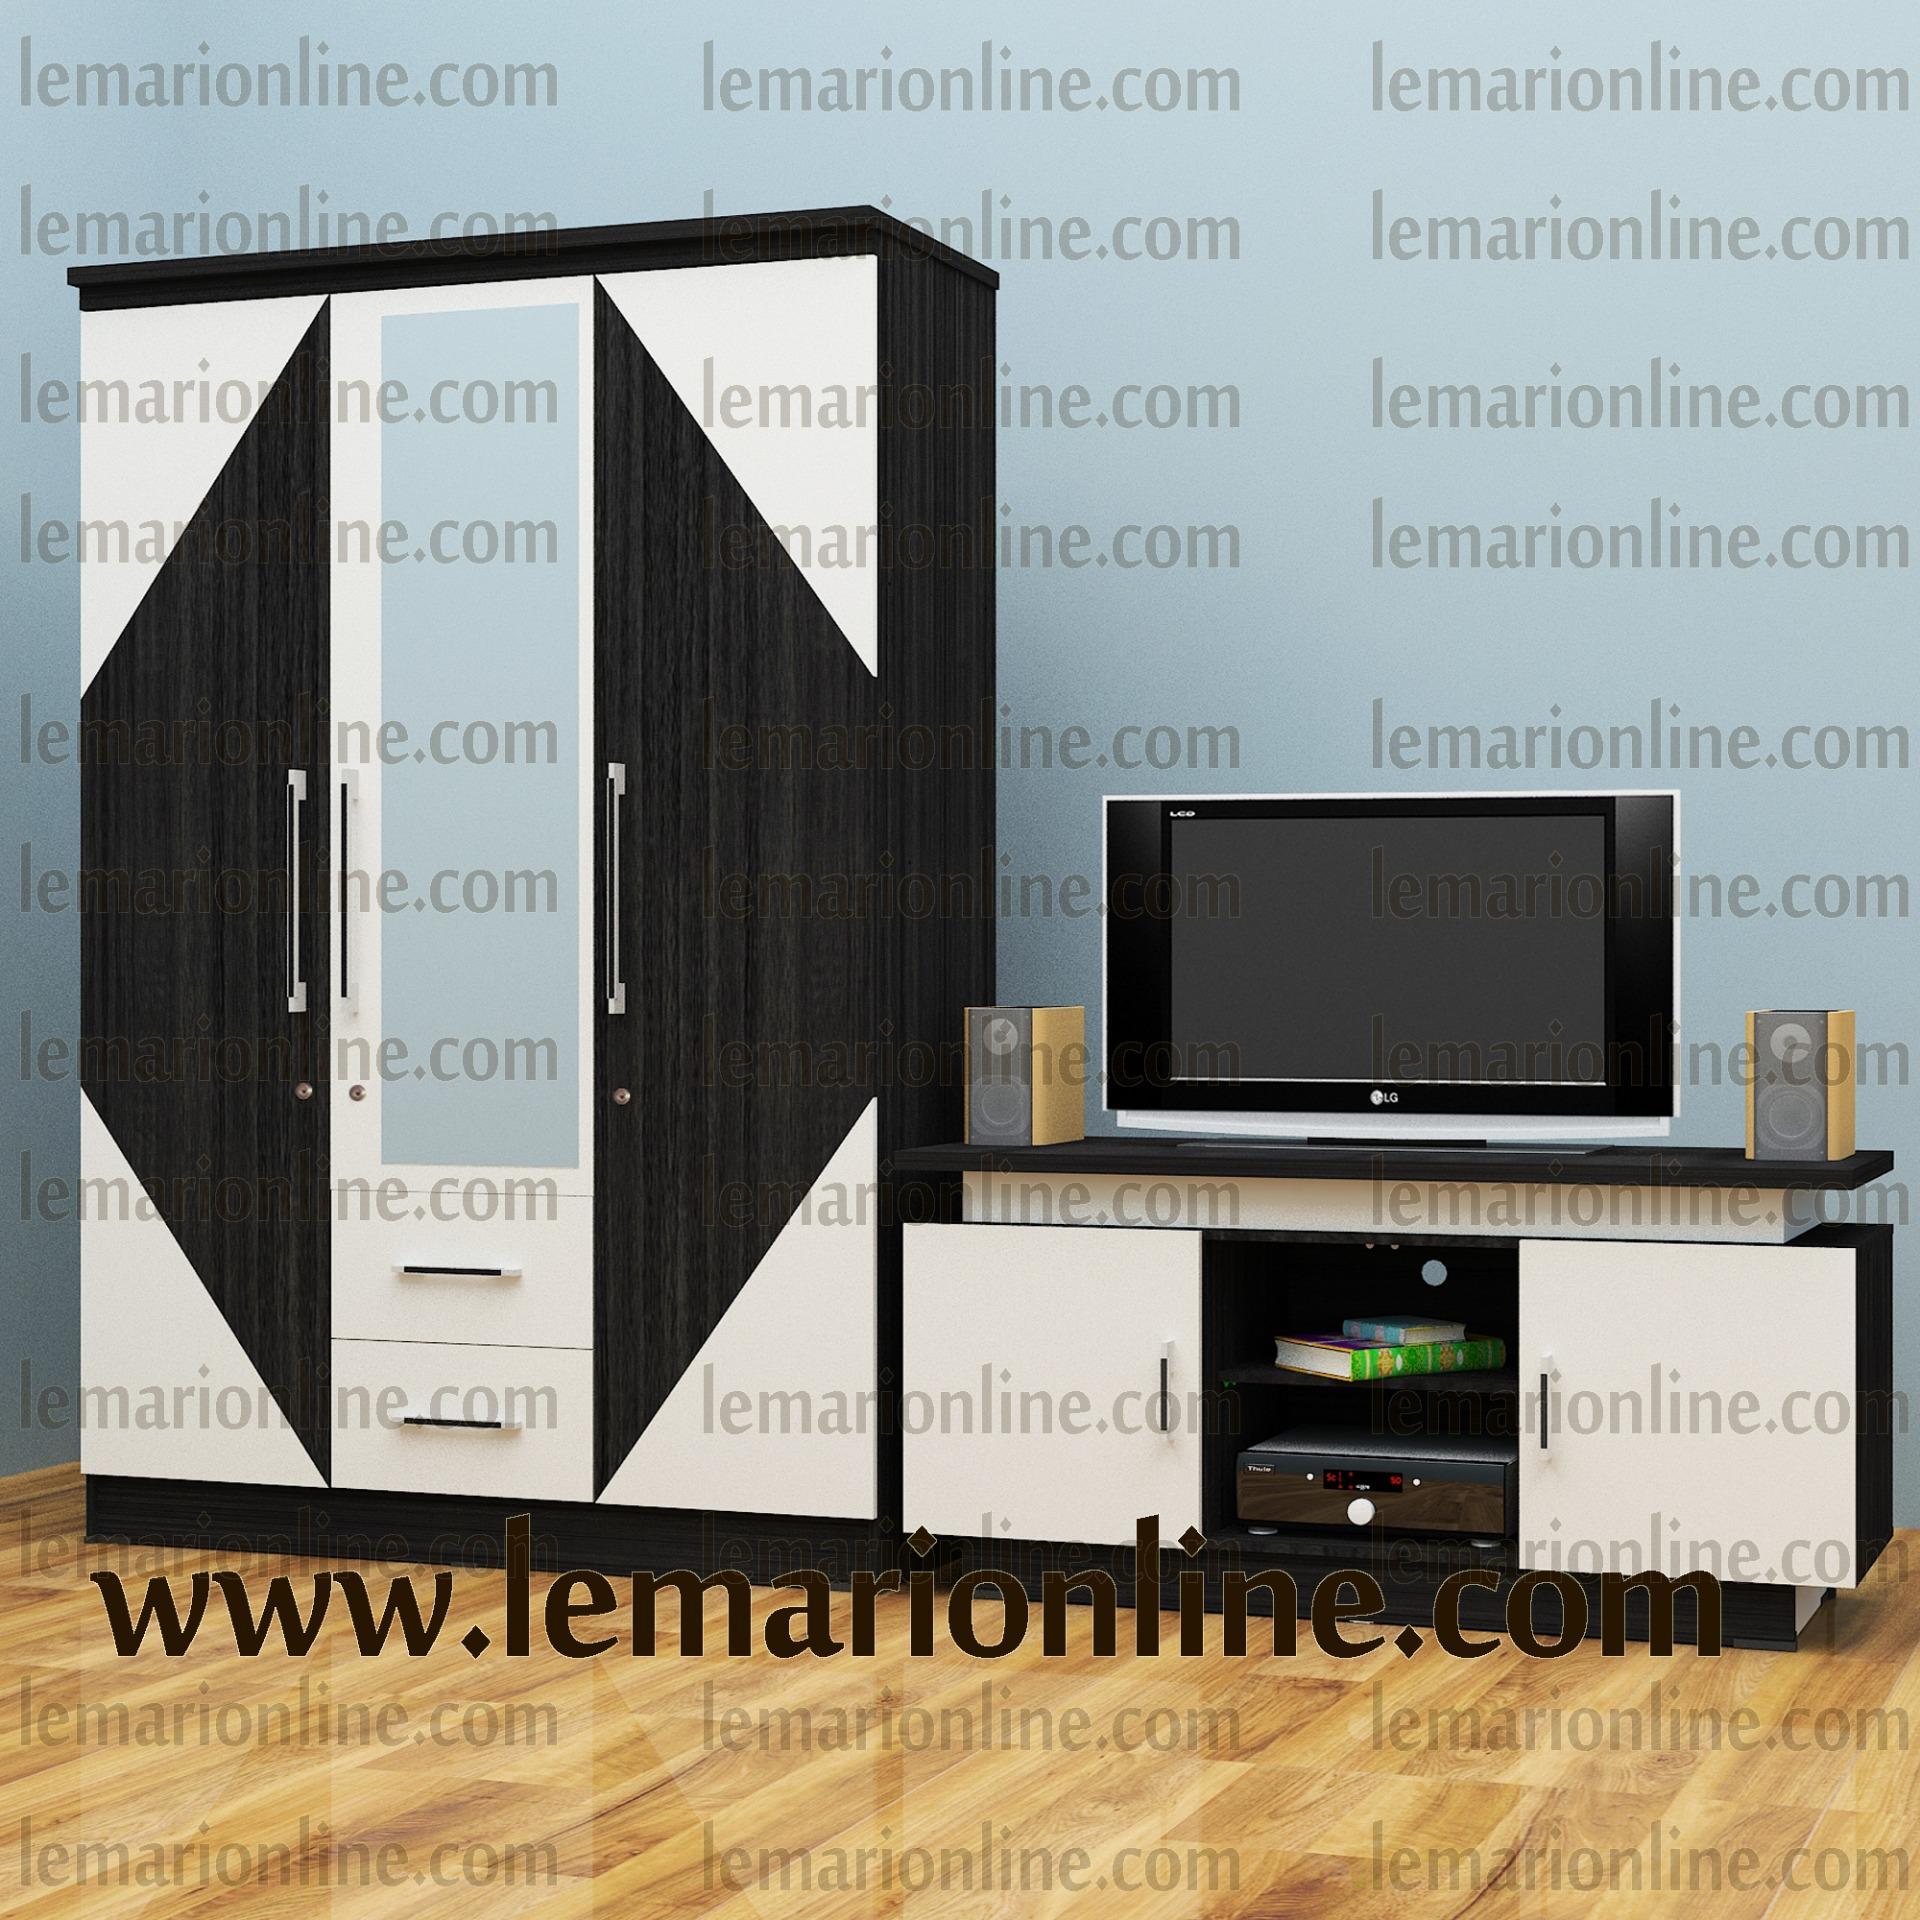 Lemari Pakaian 3 Pintu Cermin & Meja TV (Paket New Product)